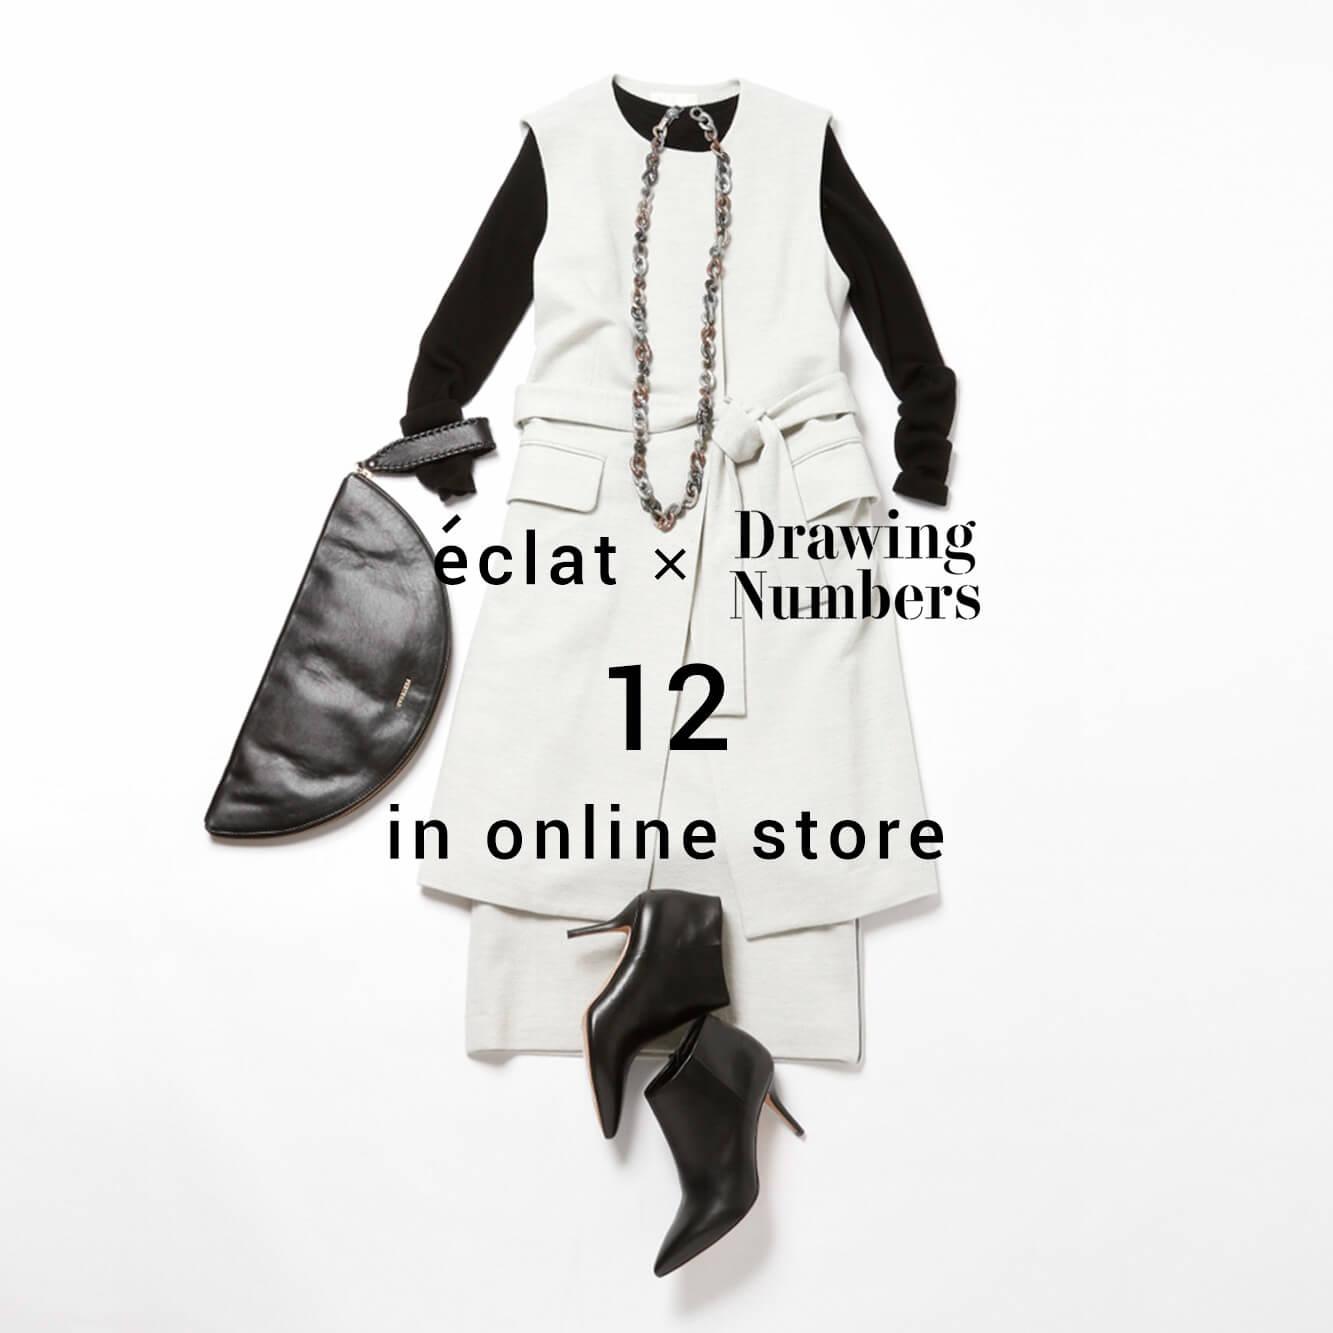 eclat×Drawing Numbers別注アイテム販売開始